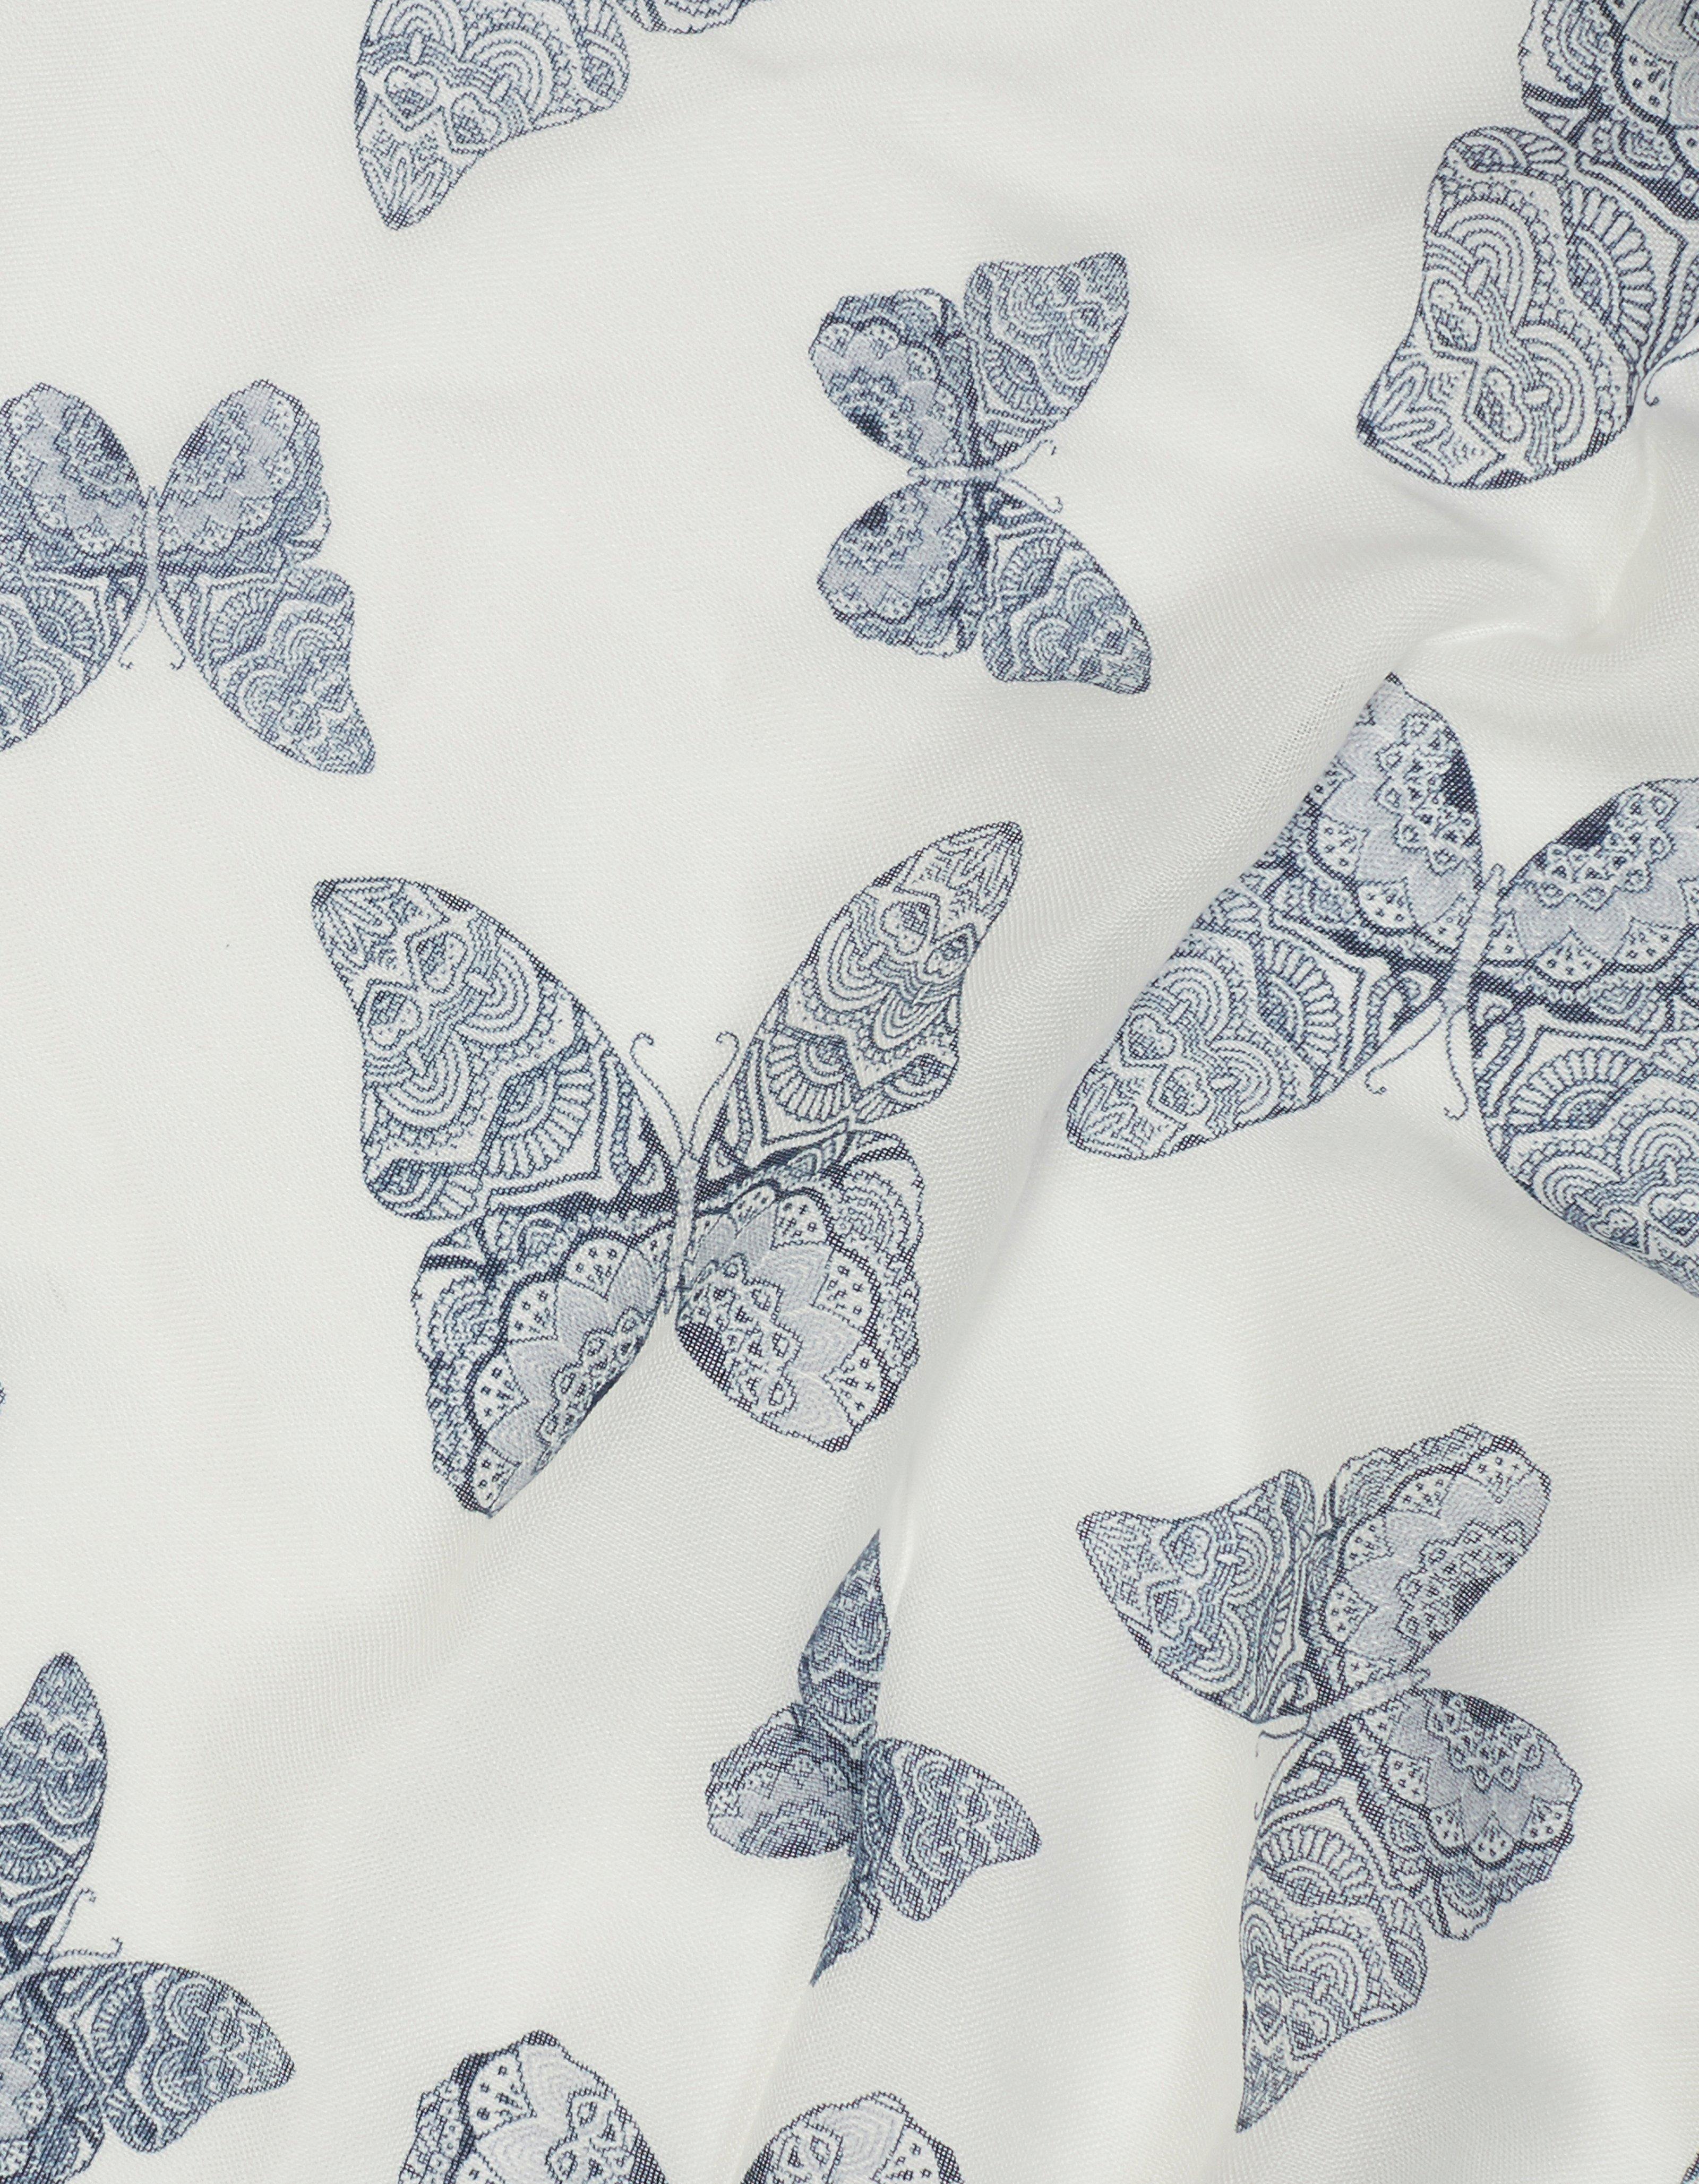 Mandala Butterfly Scarf